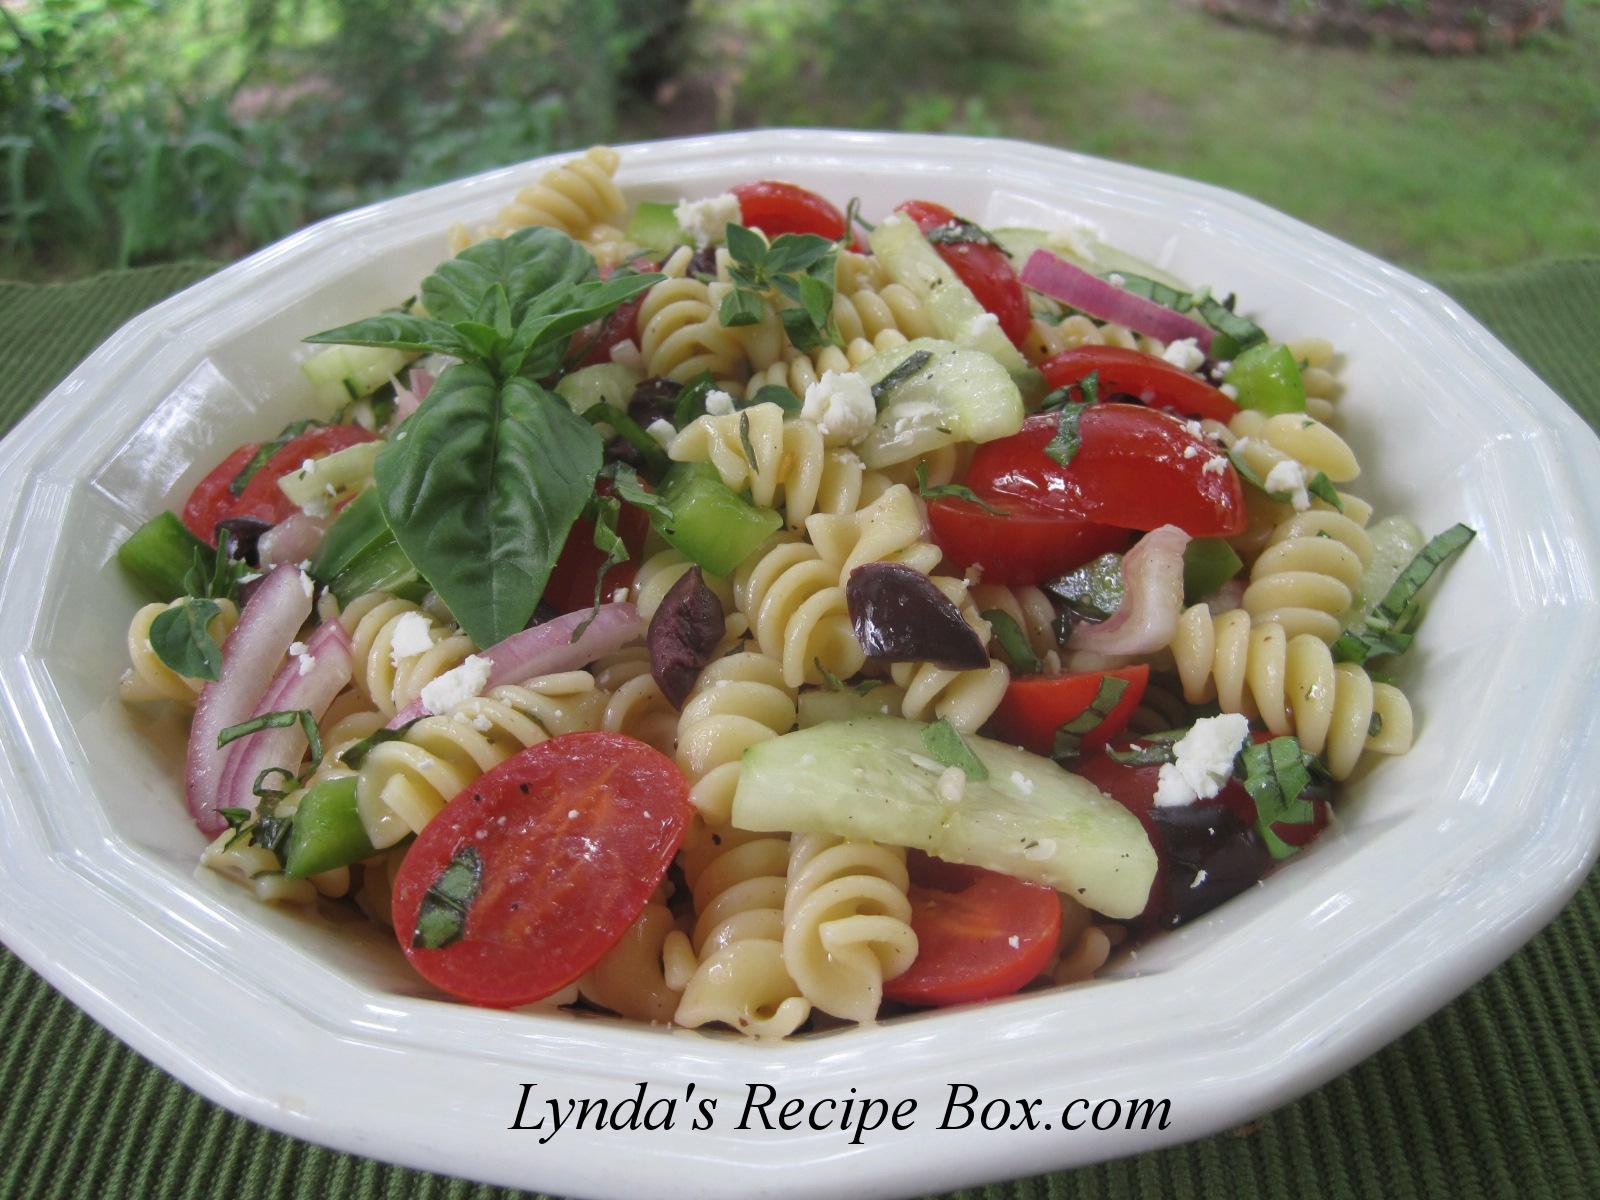 Lynda's Recipe Box: Mediterranean Style Pasta Salad